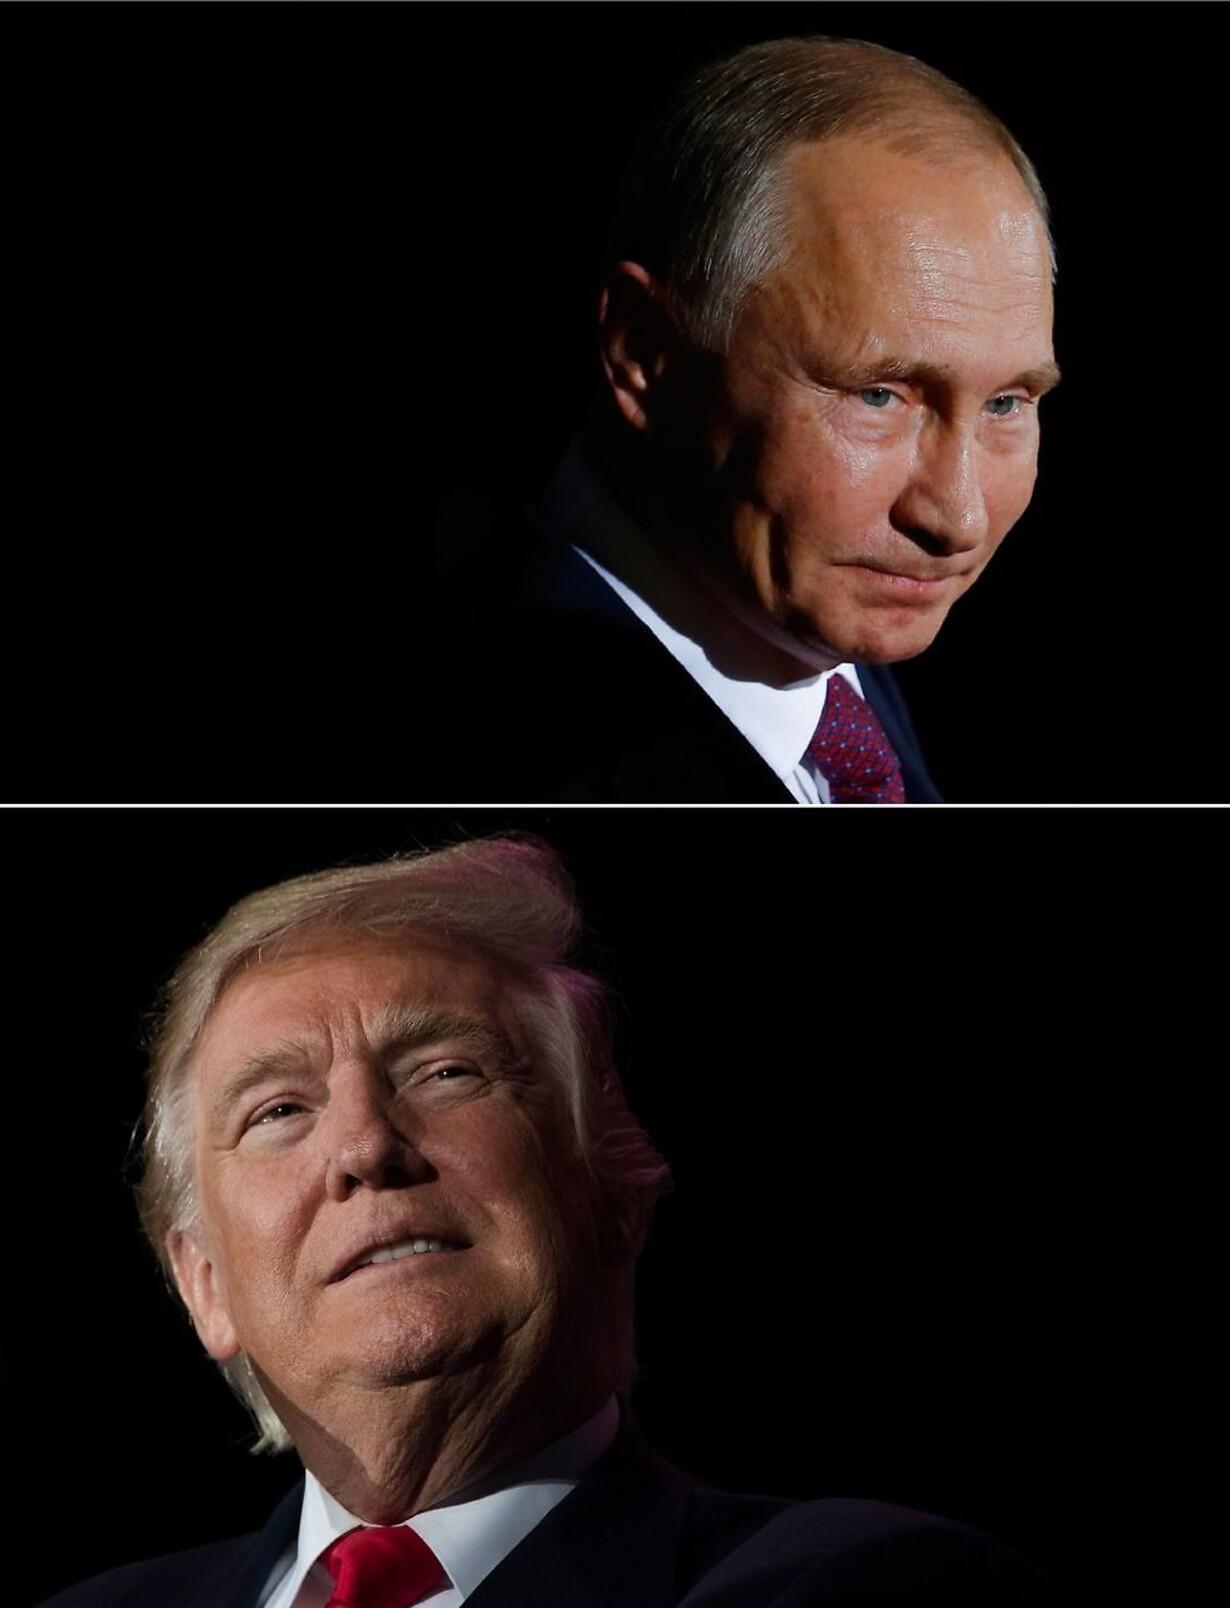 FILES-COMBO-US-POLITICS-DIPLOMACY-RUSSIA-VENEZUELA